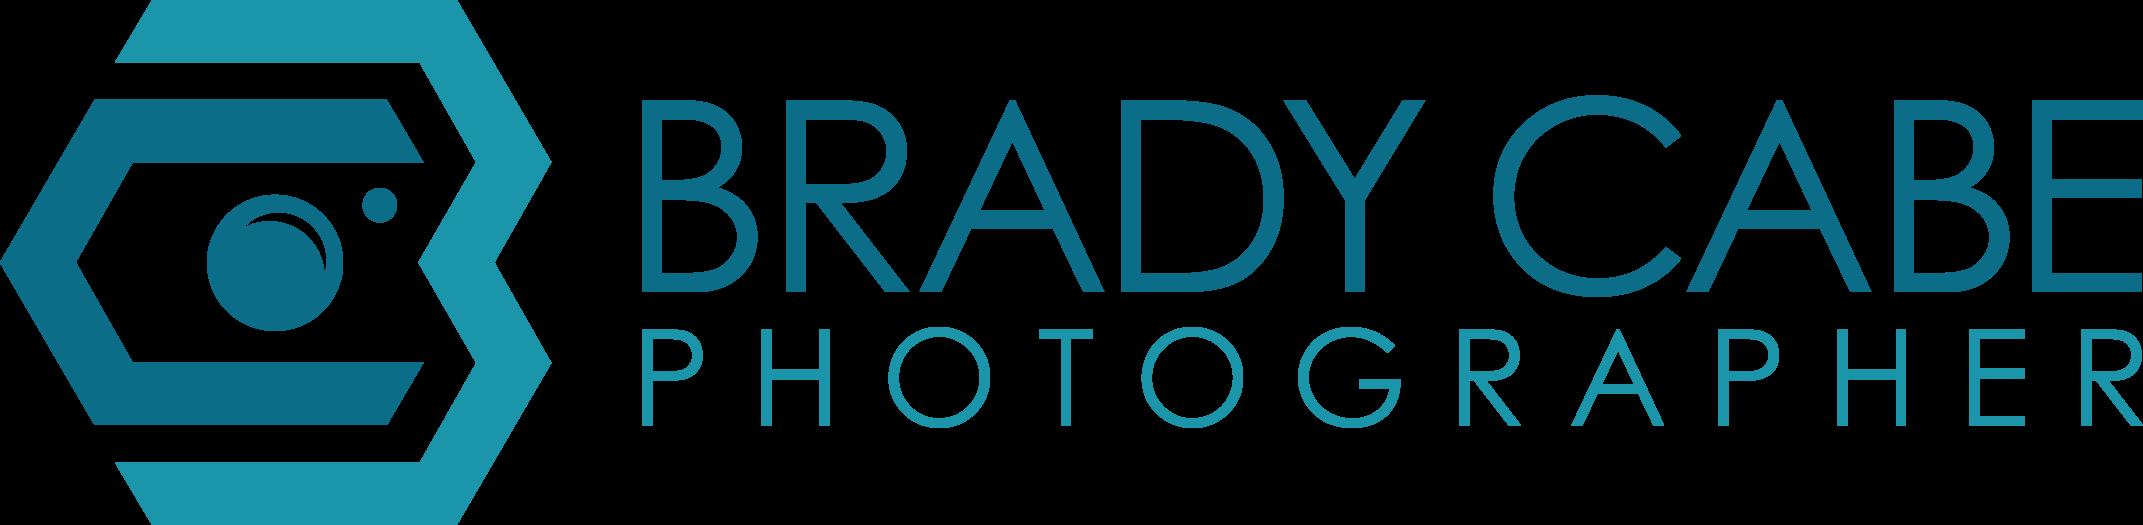 Brady Cabe Photographer Central California photography